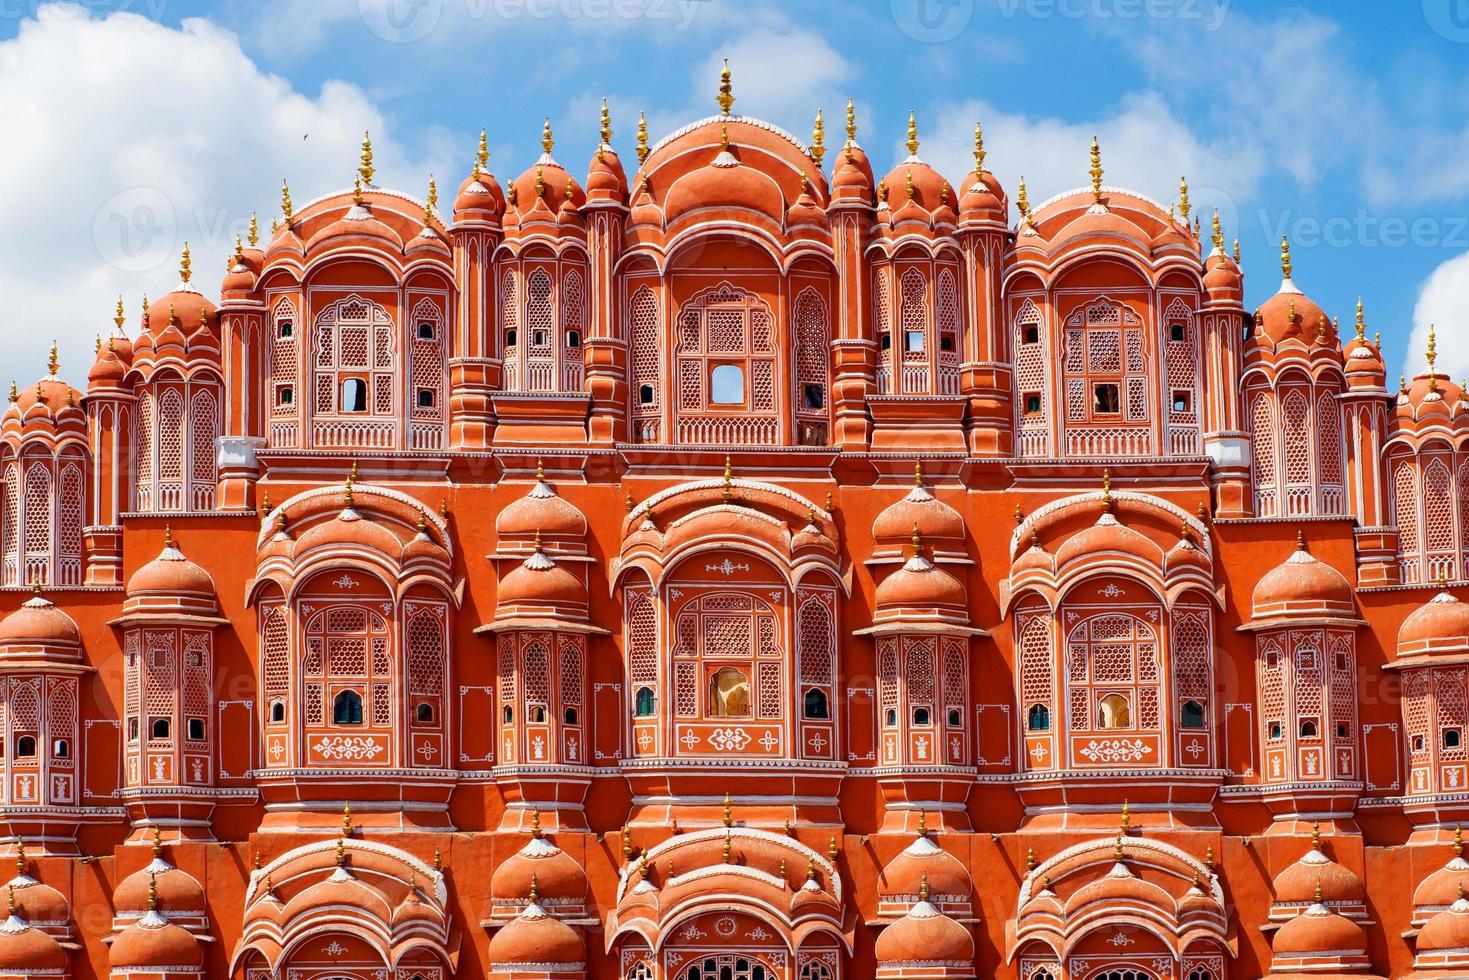 Hawa Mahal Palast (Palast der Winde) in Jaipur, Rajasthan foto